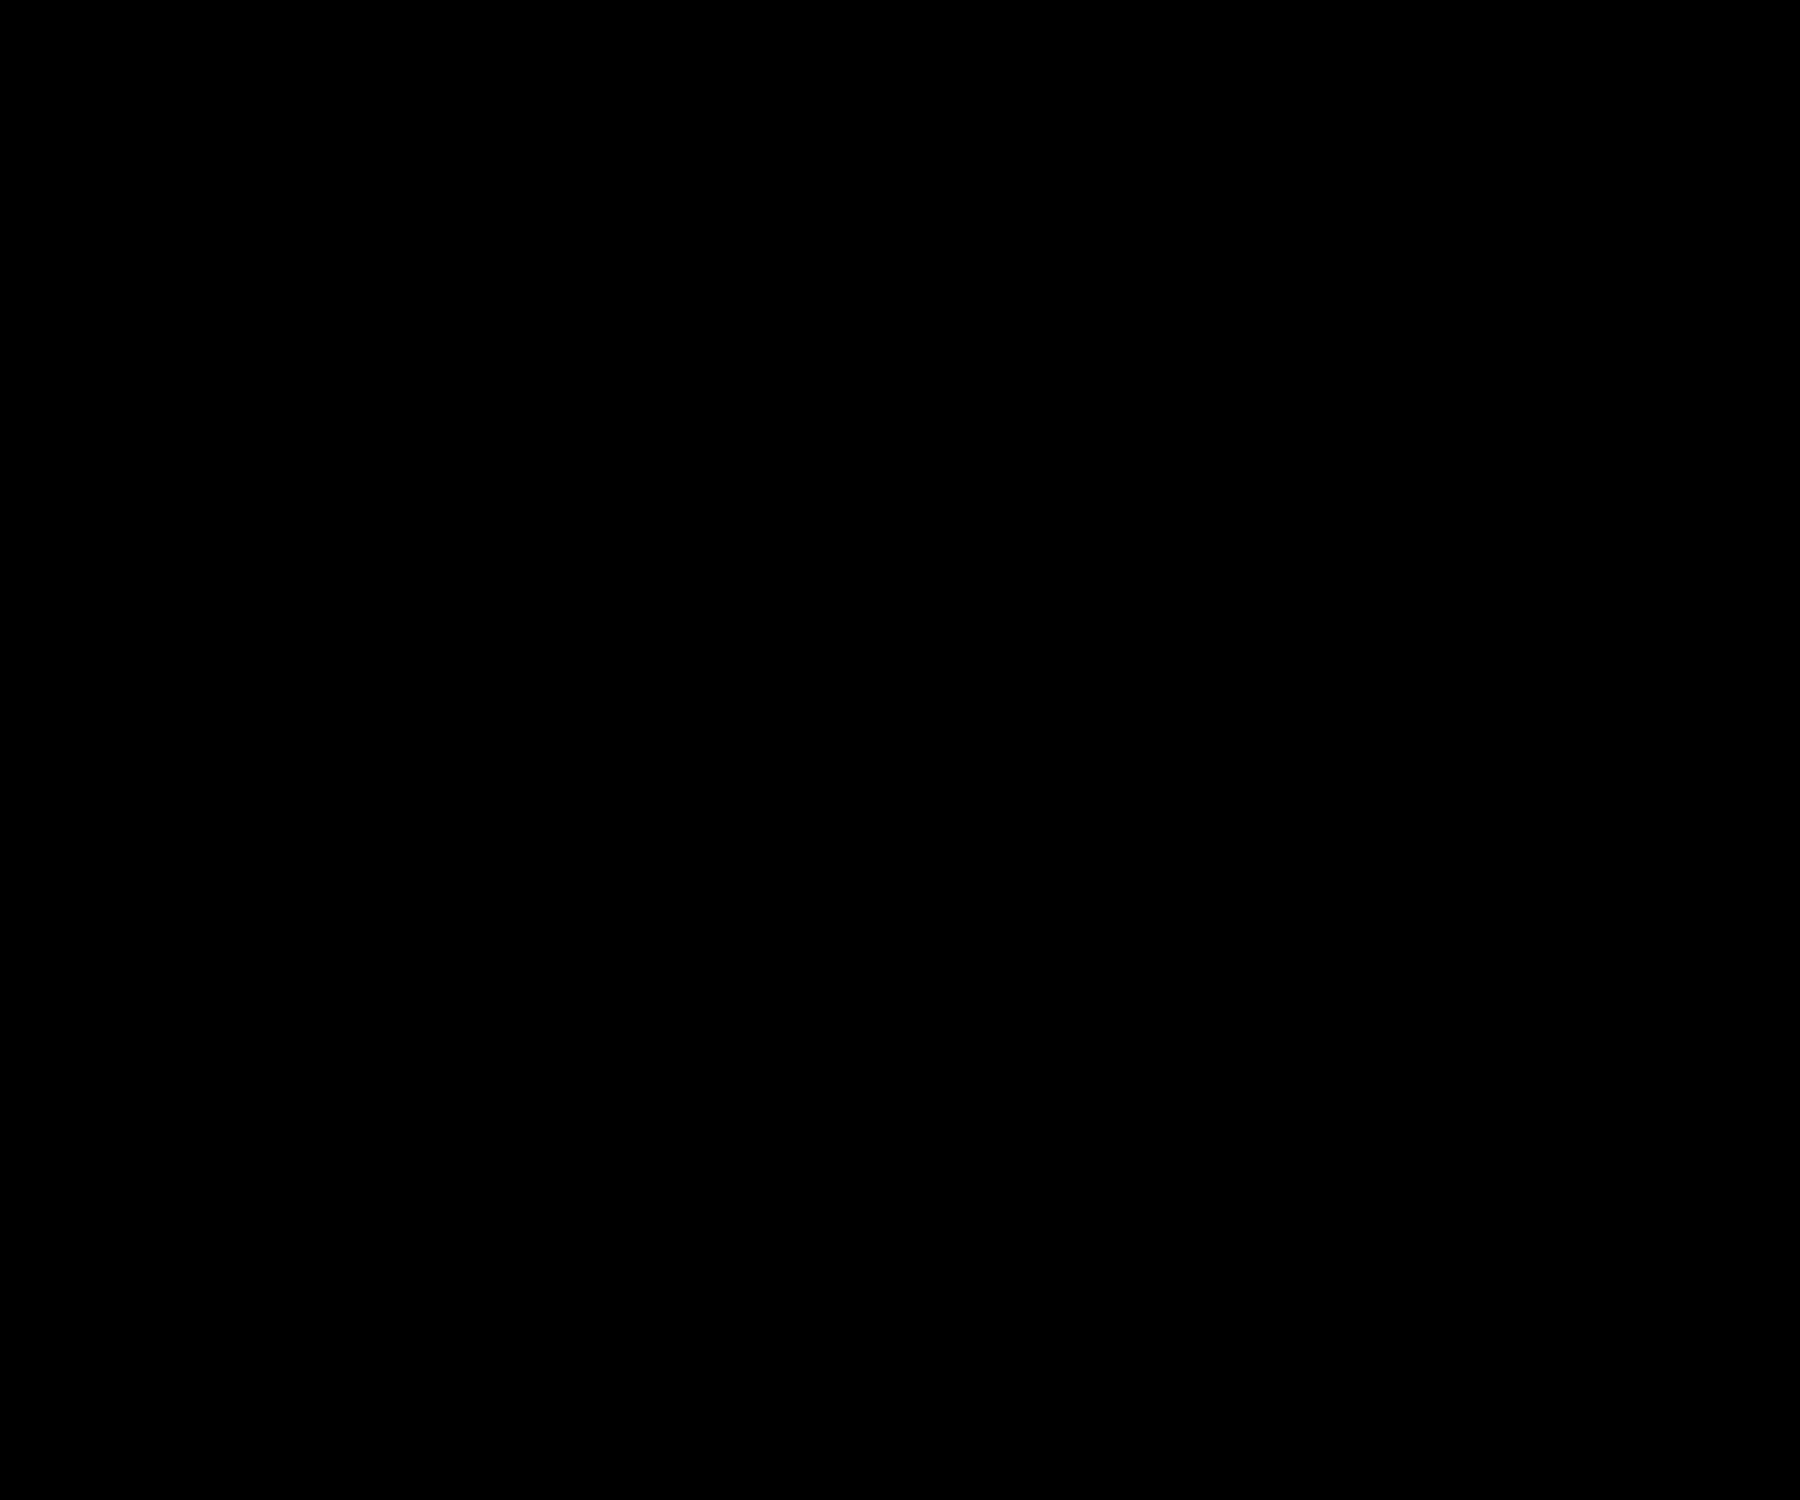 nasa BLACK2